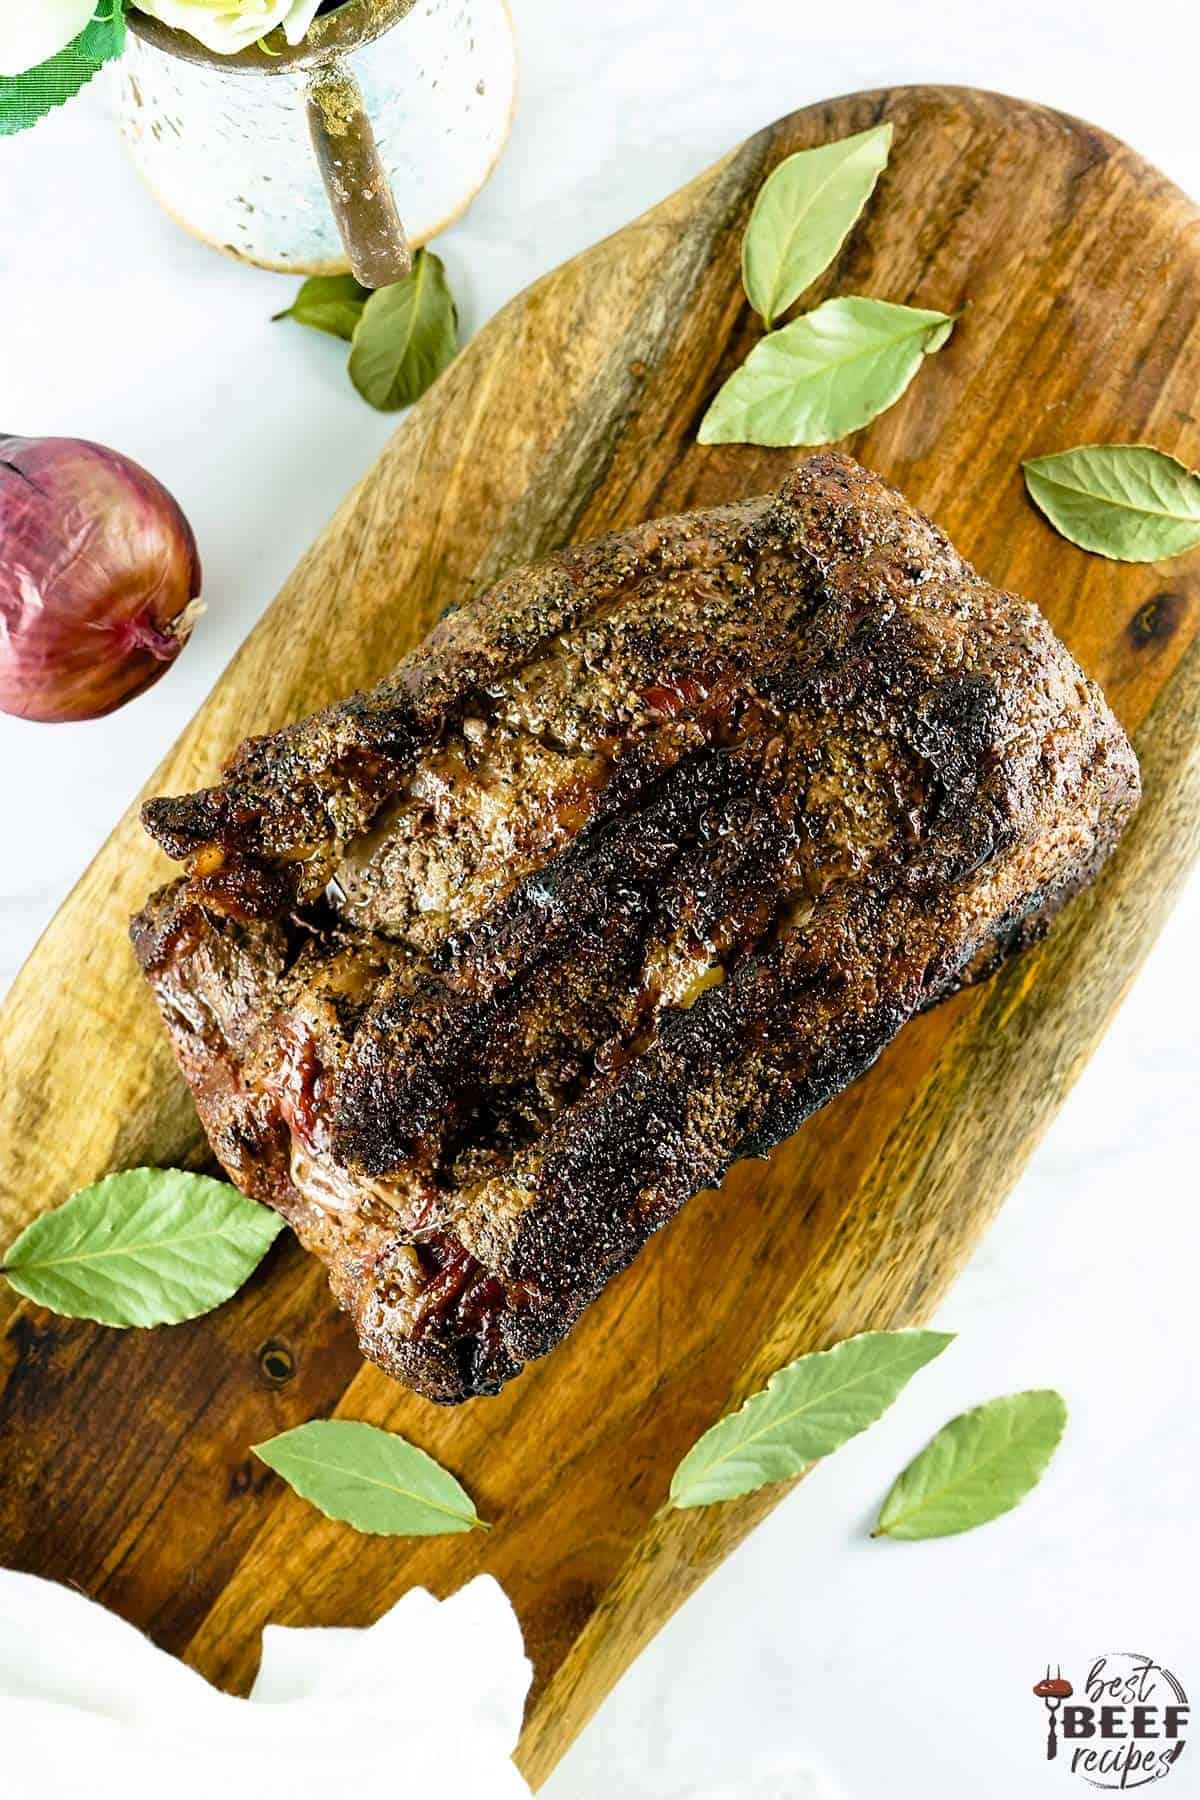 Whole smoked prime rib on a cutting board